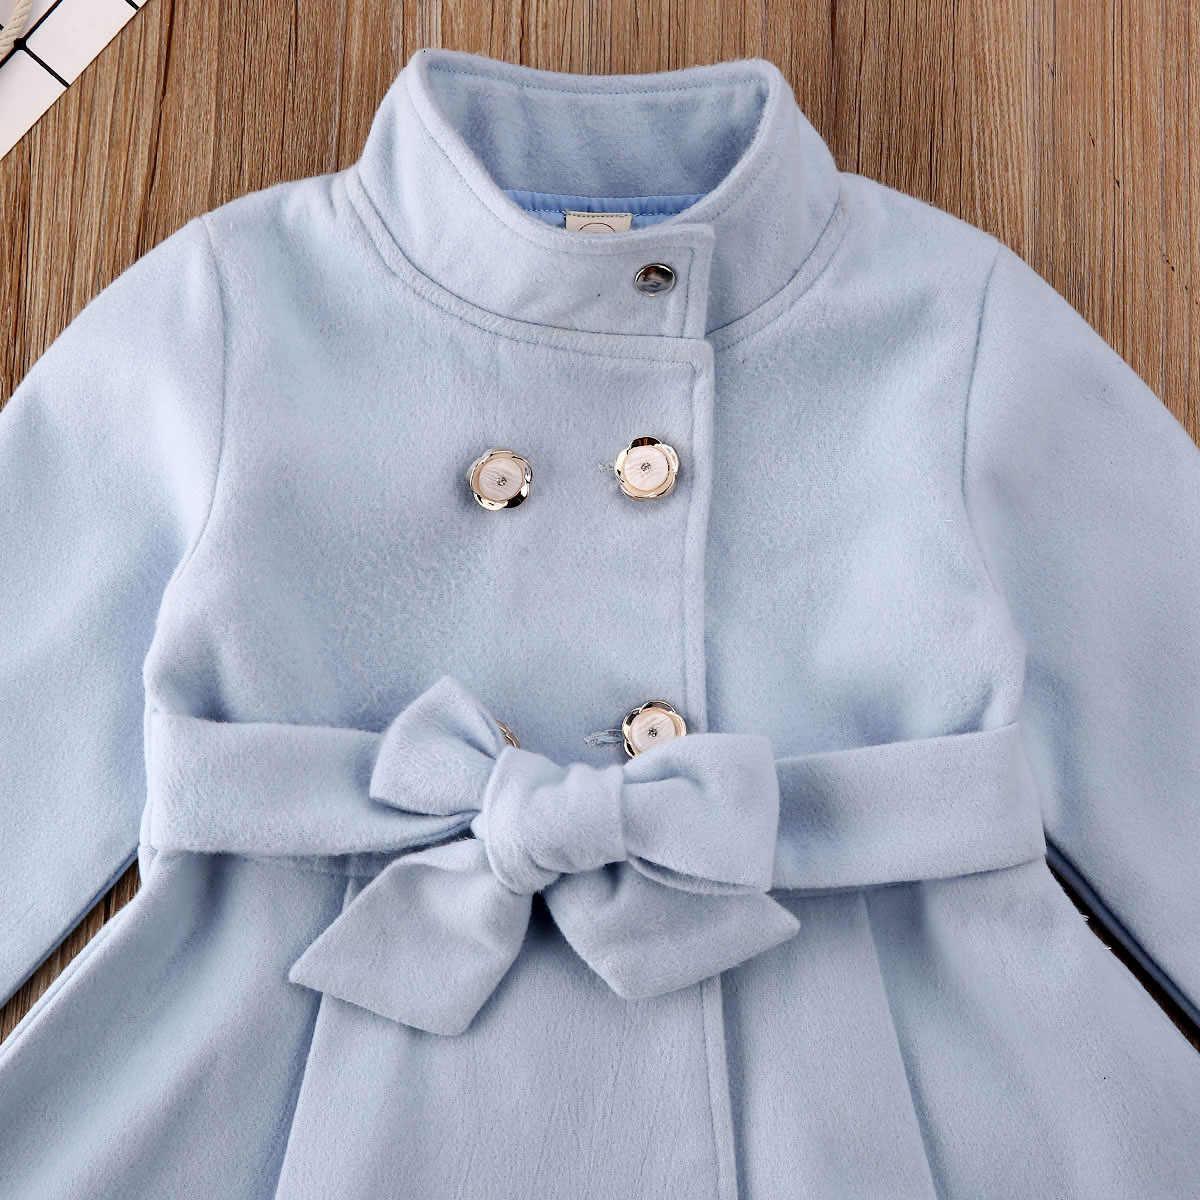 Meisje Geul Elegante Peuter Baby Meisje Bovenkleding Lange Jurk Windjack Jas Herfst Winter Maat 1-5Y